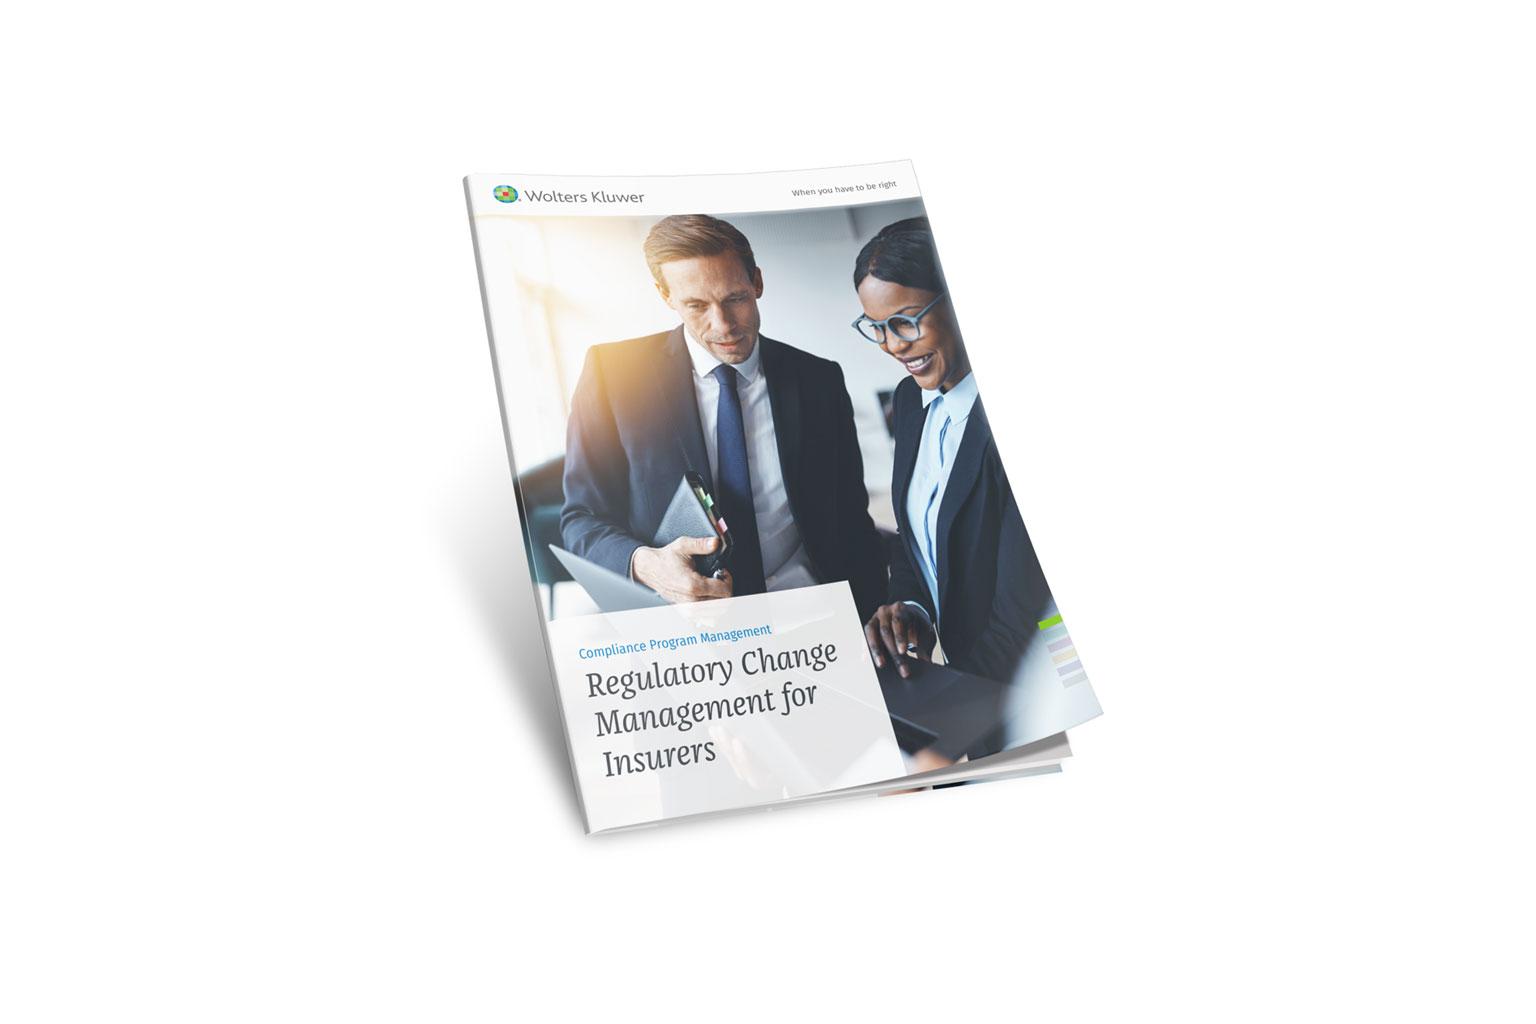 Regulatory Change Management for Insurers